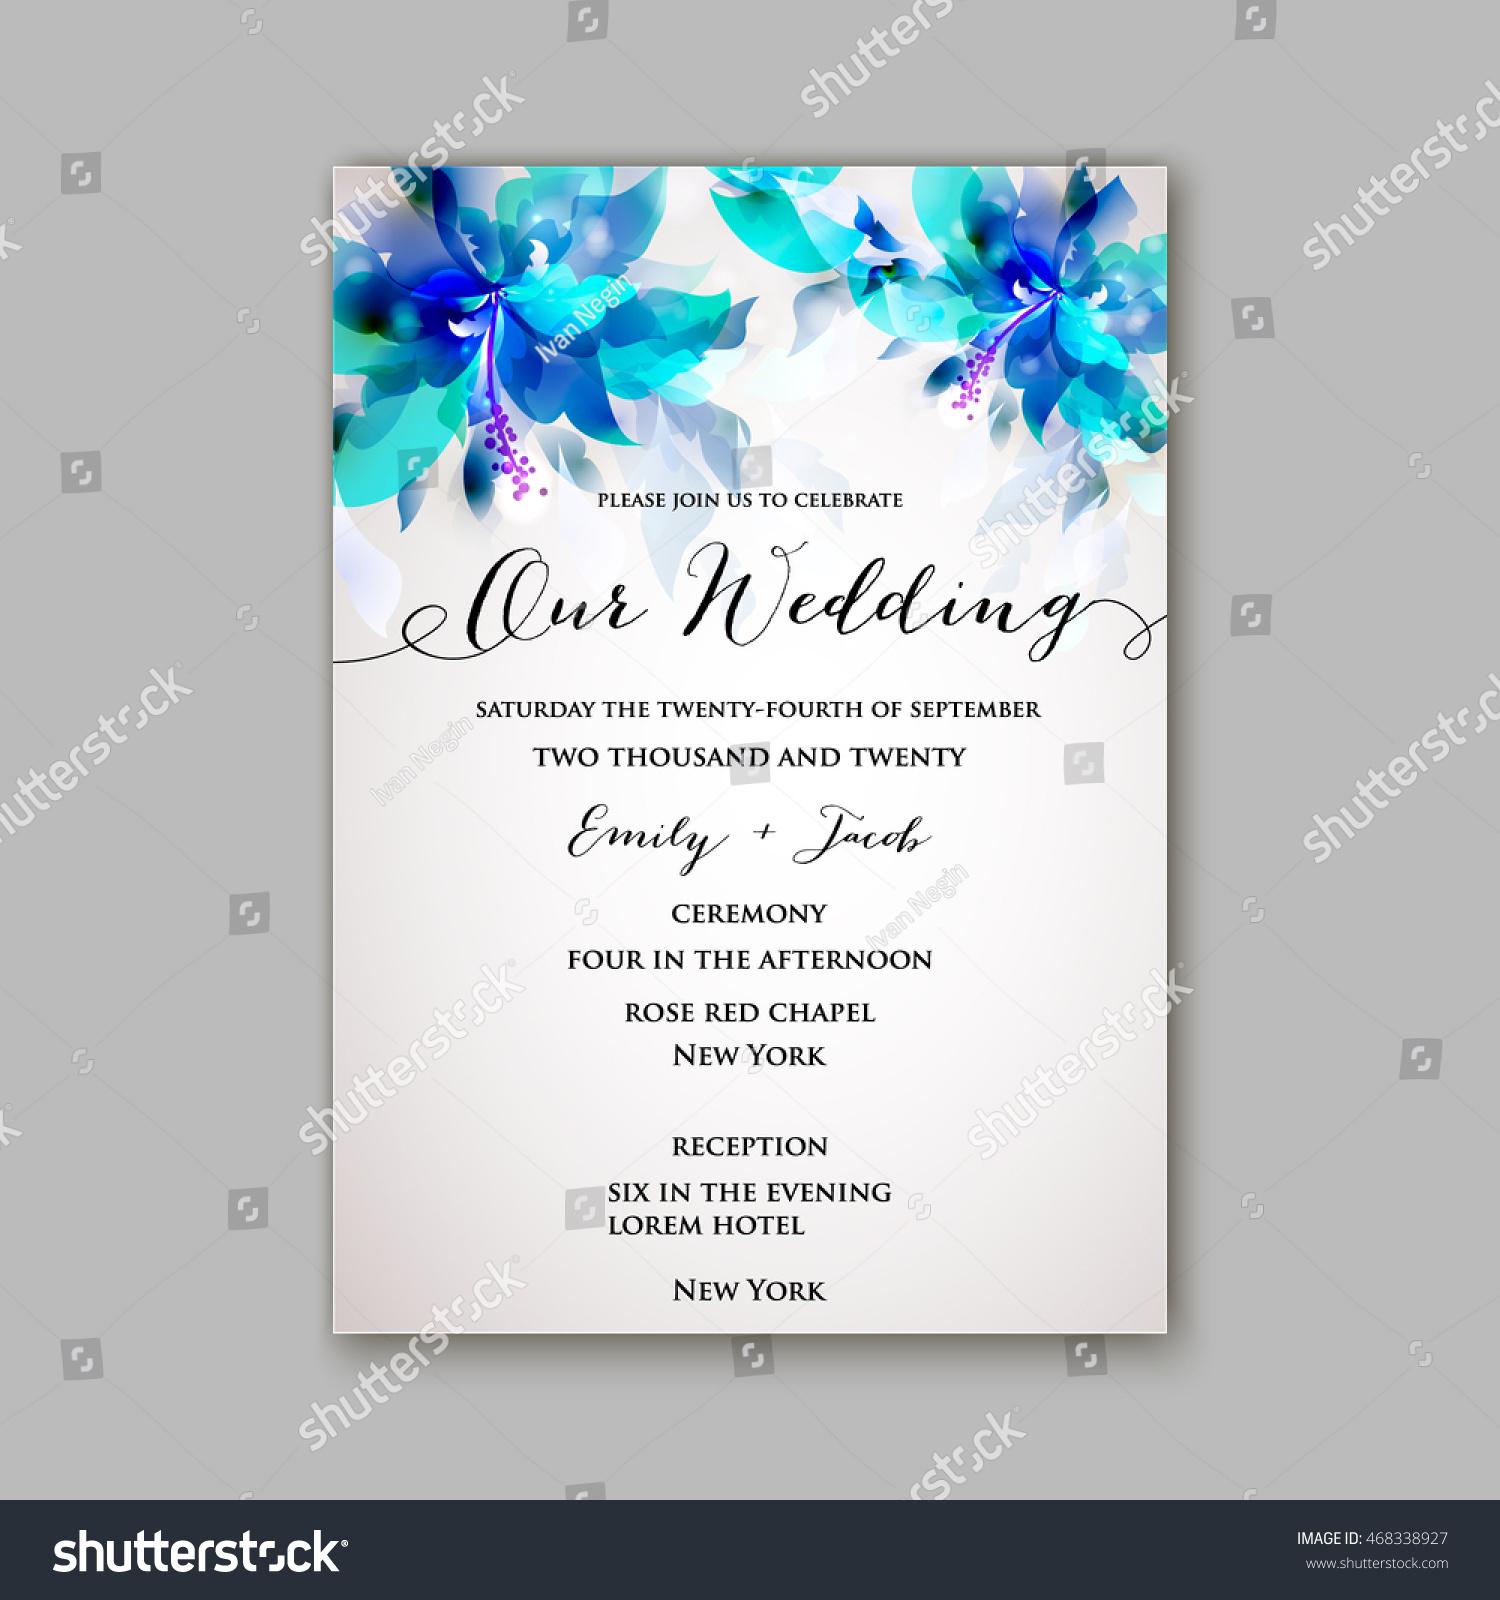 Wedding invitation or card with floral chrysanthemum   EZ Canvas